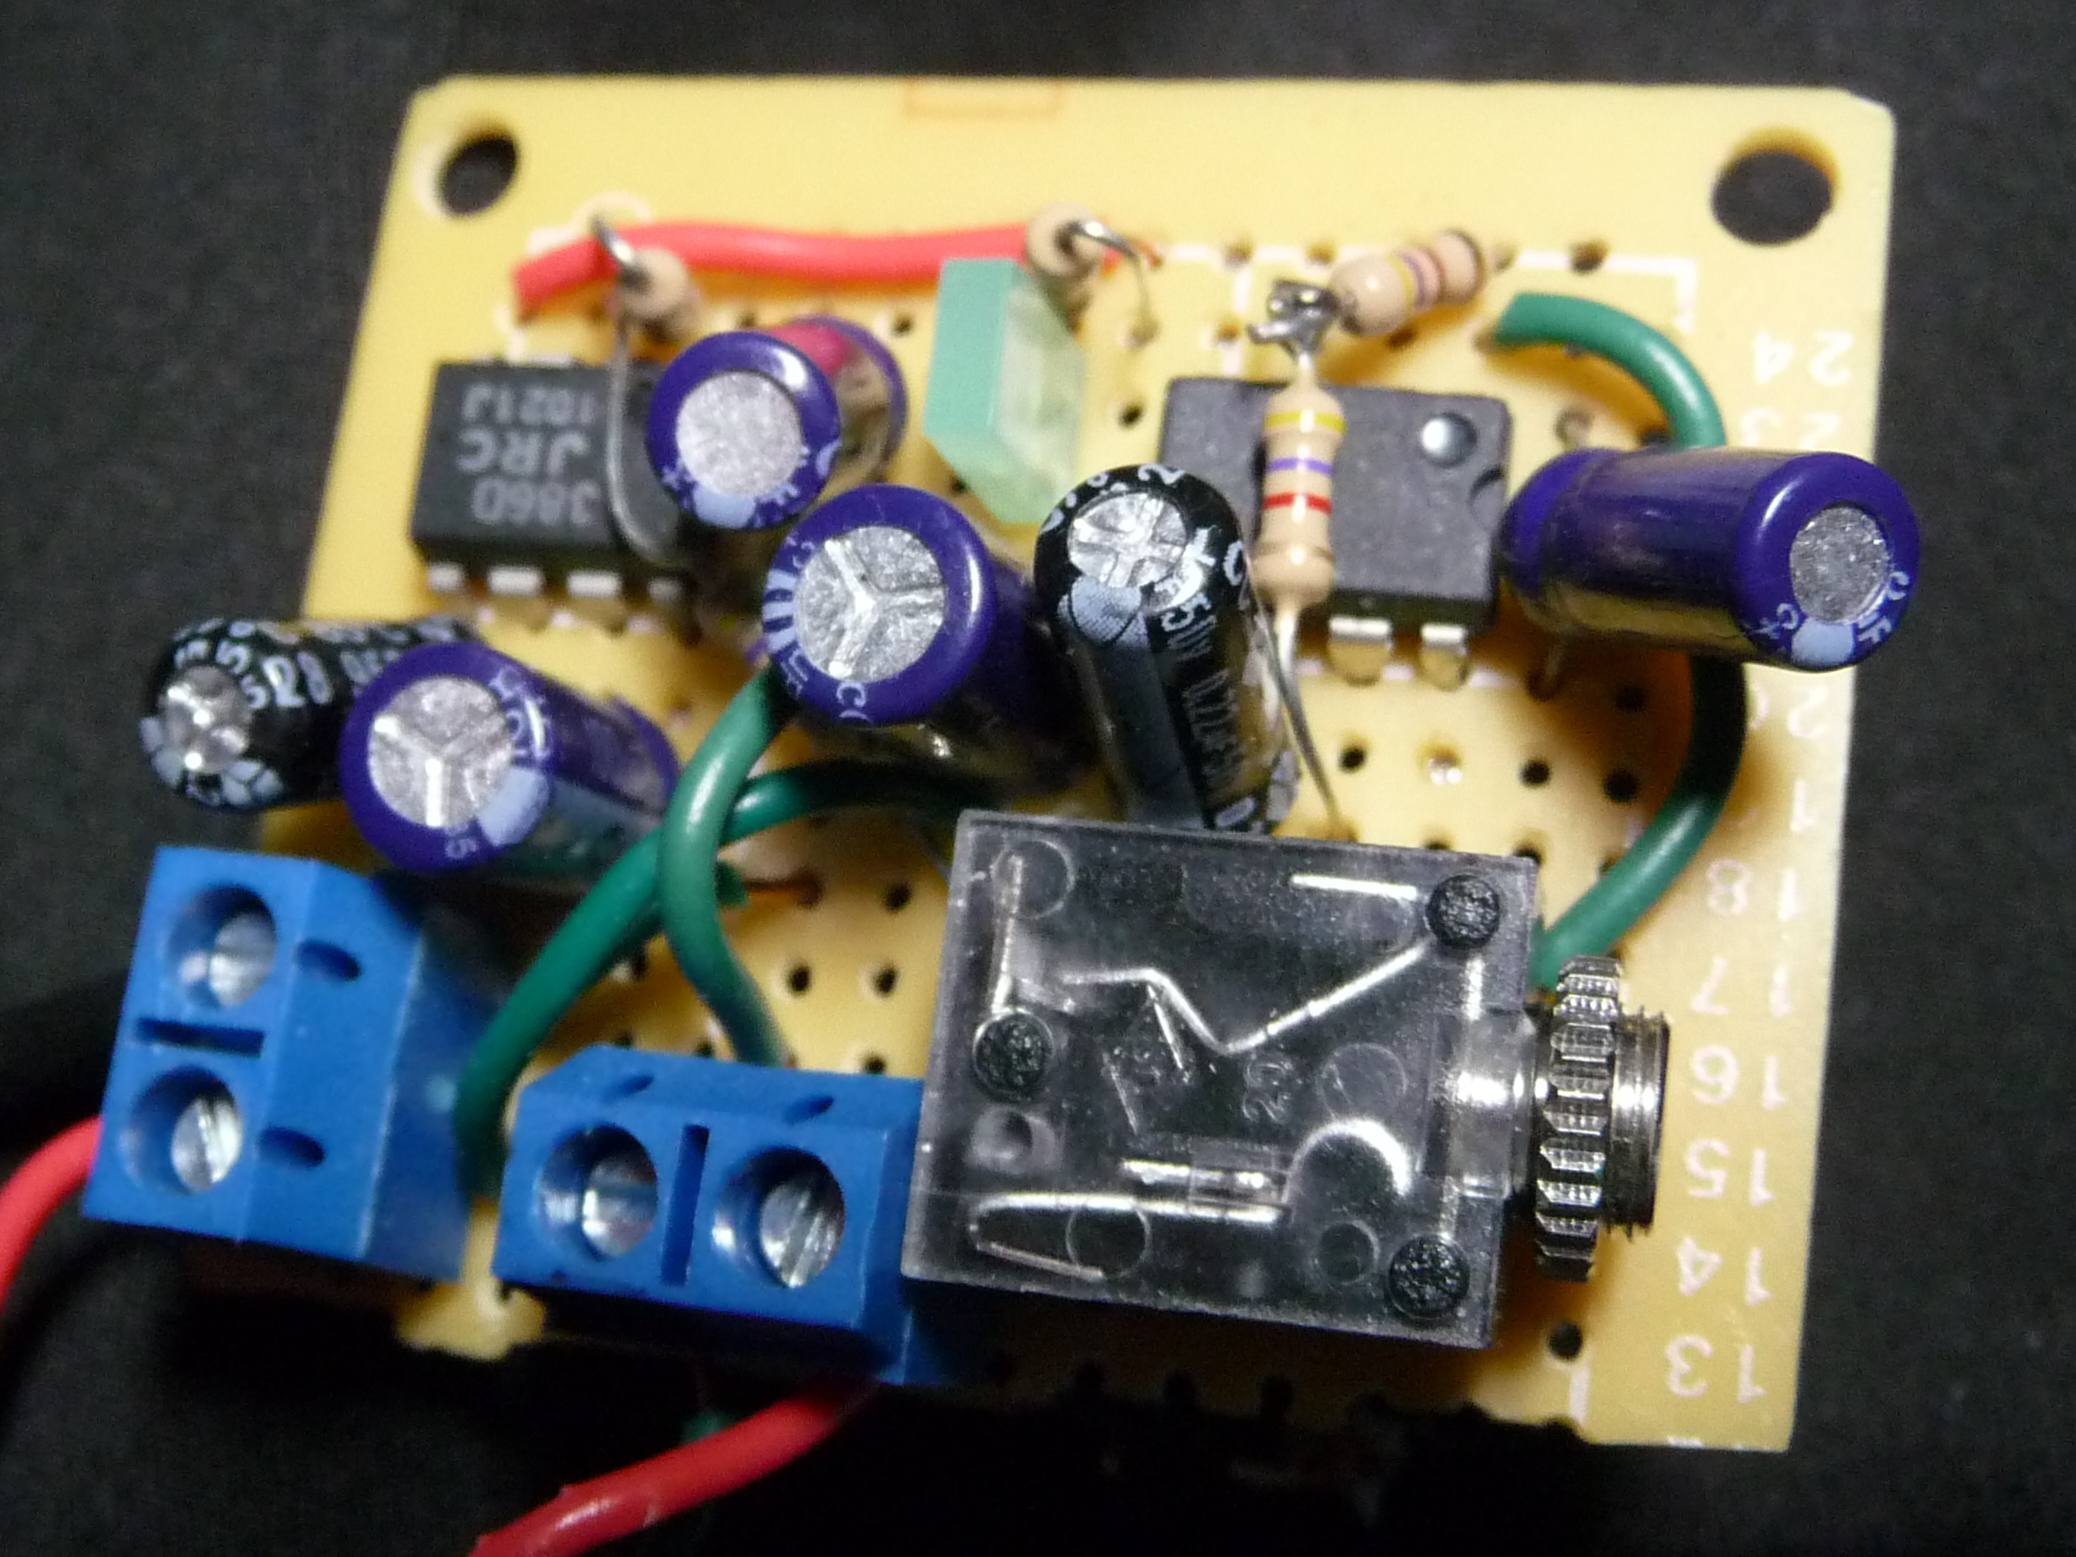 audio spectrum analyzer circuit diagram 2001 dodge ram trailer plug wiring make